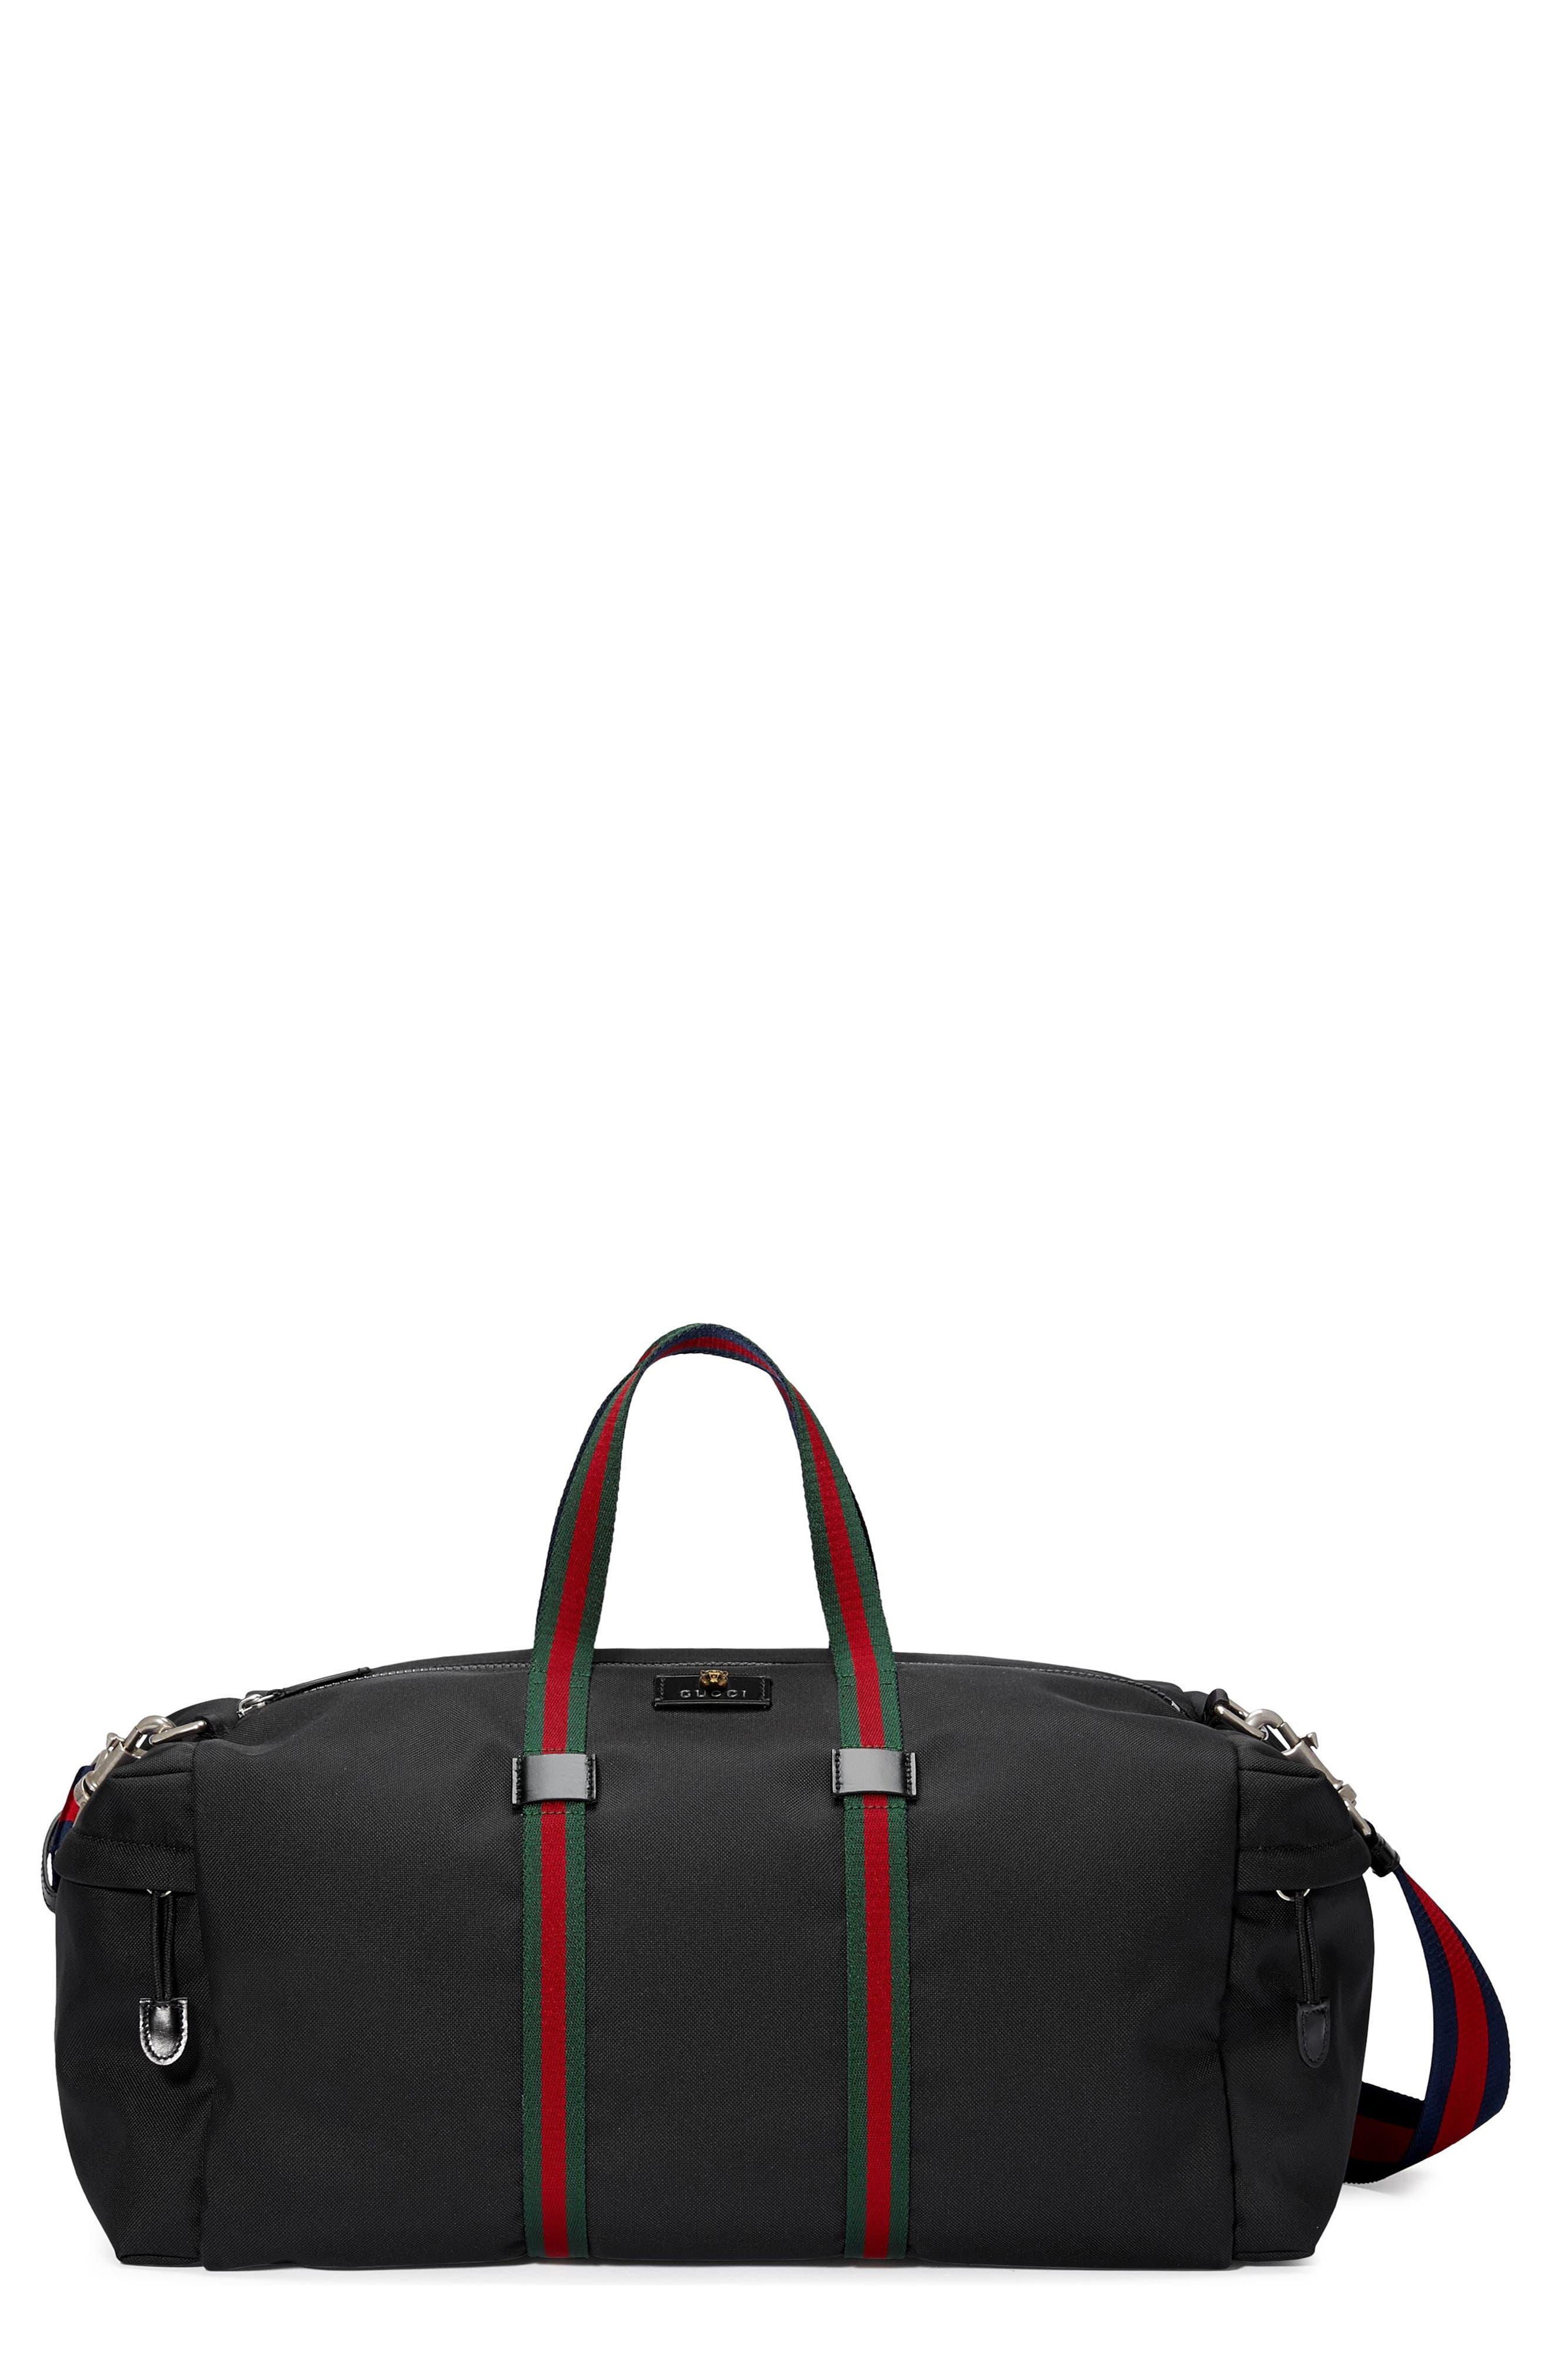 Gucci Techpack Canvas Duffle Bag